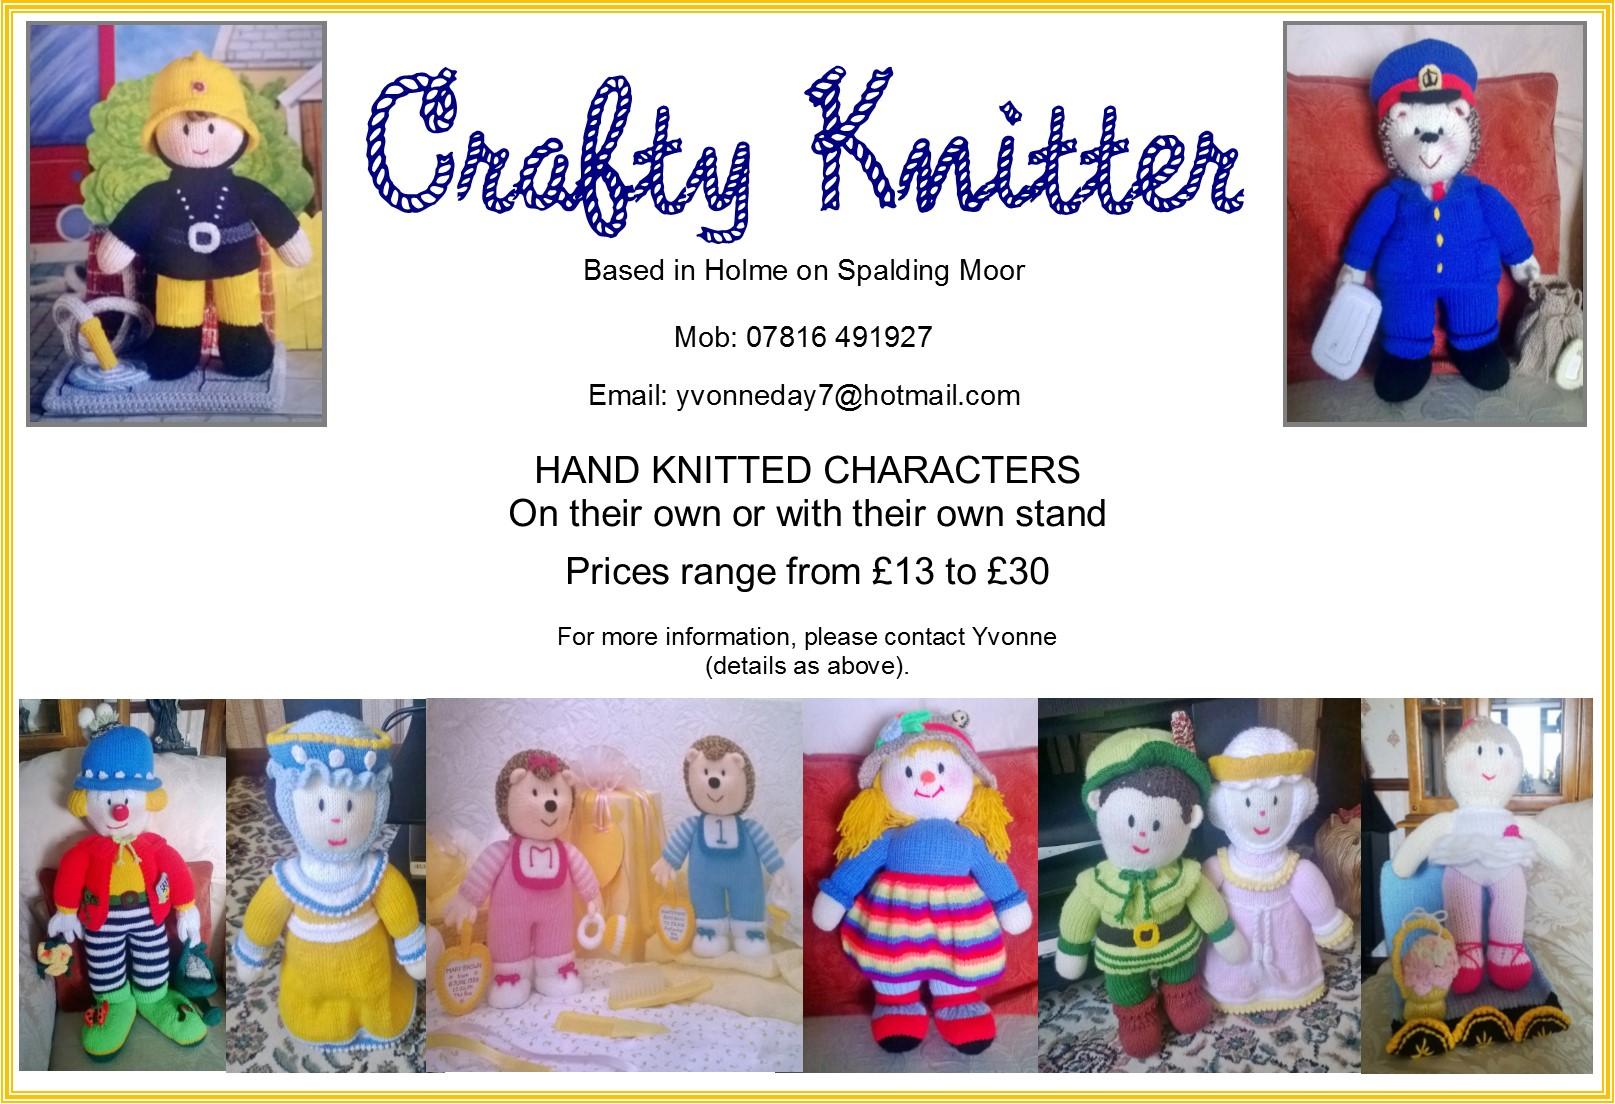 Crafty Knitter